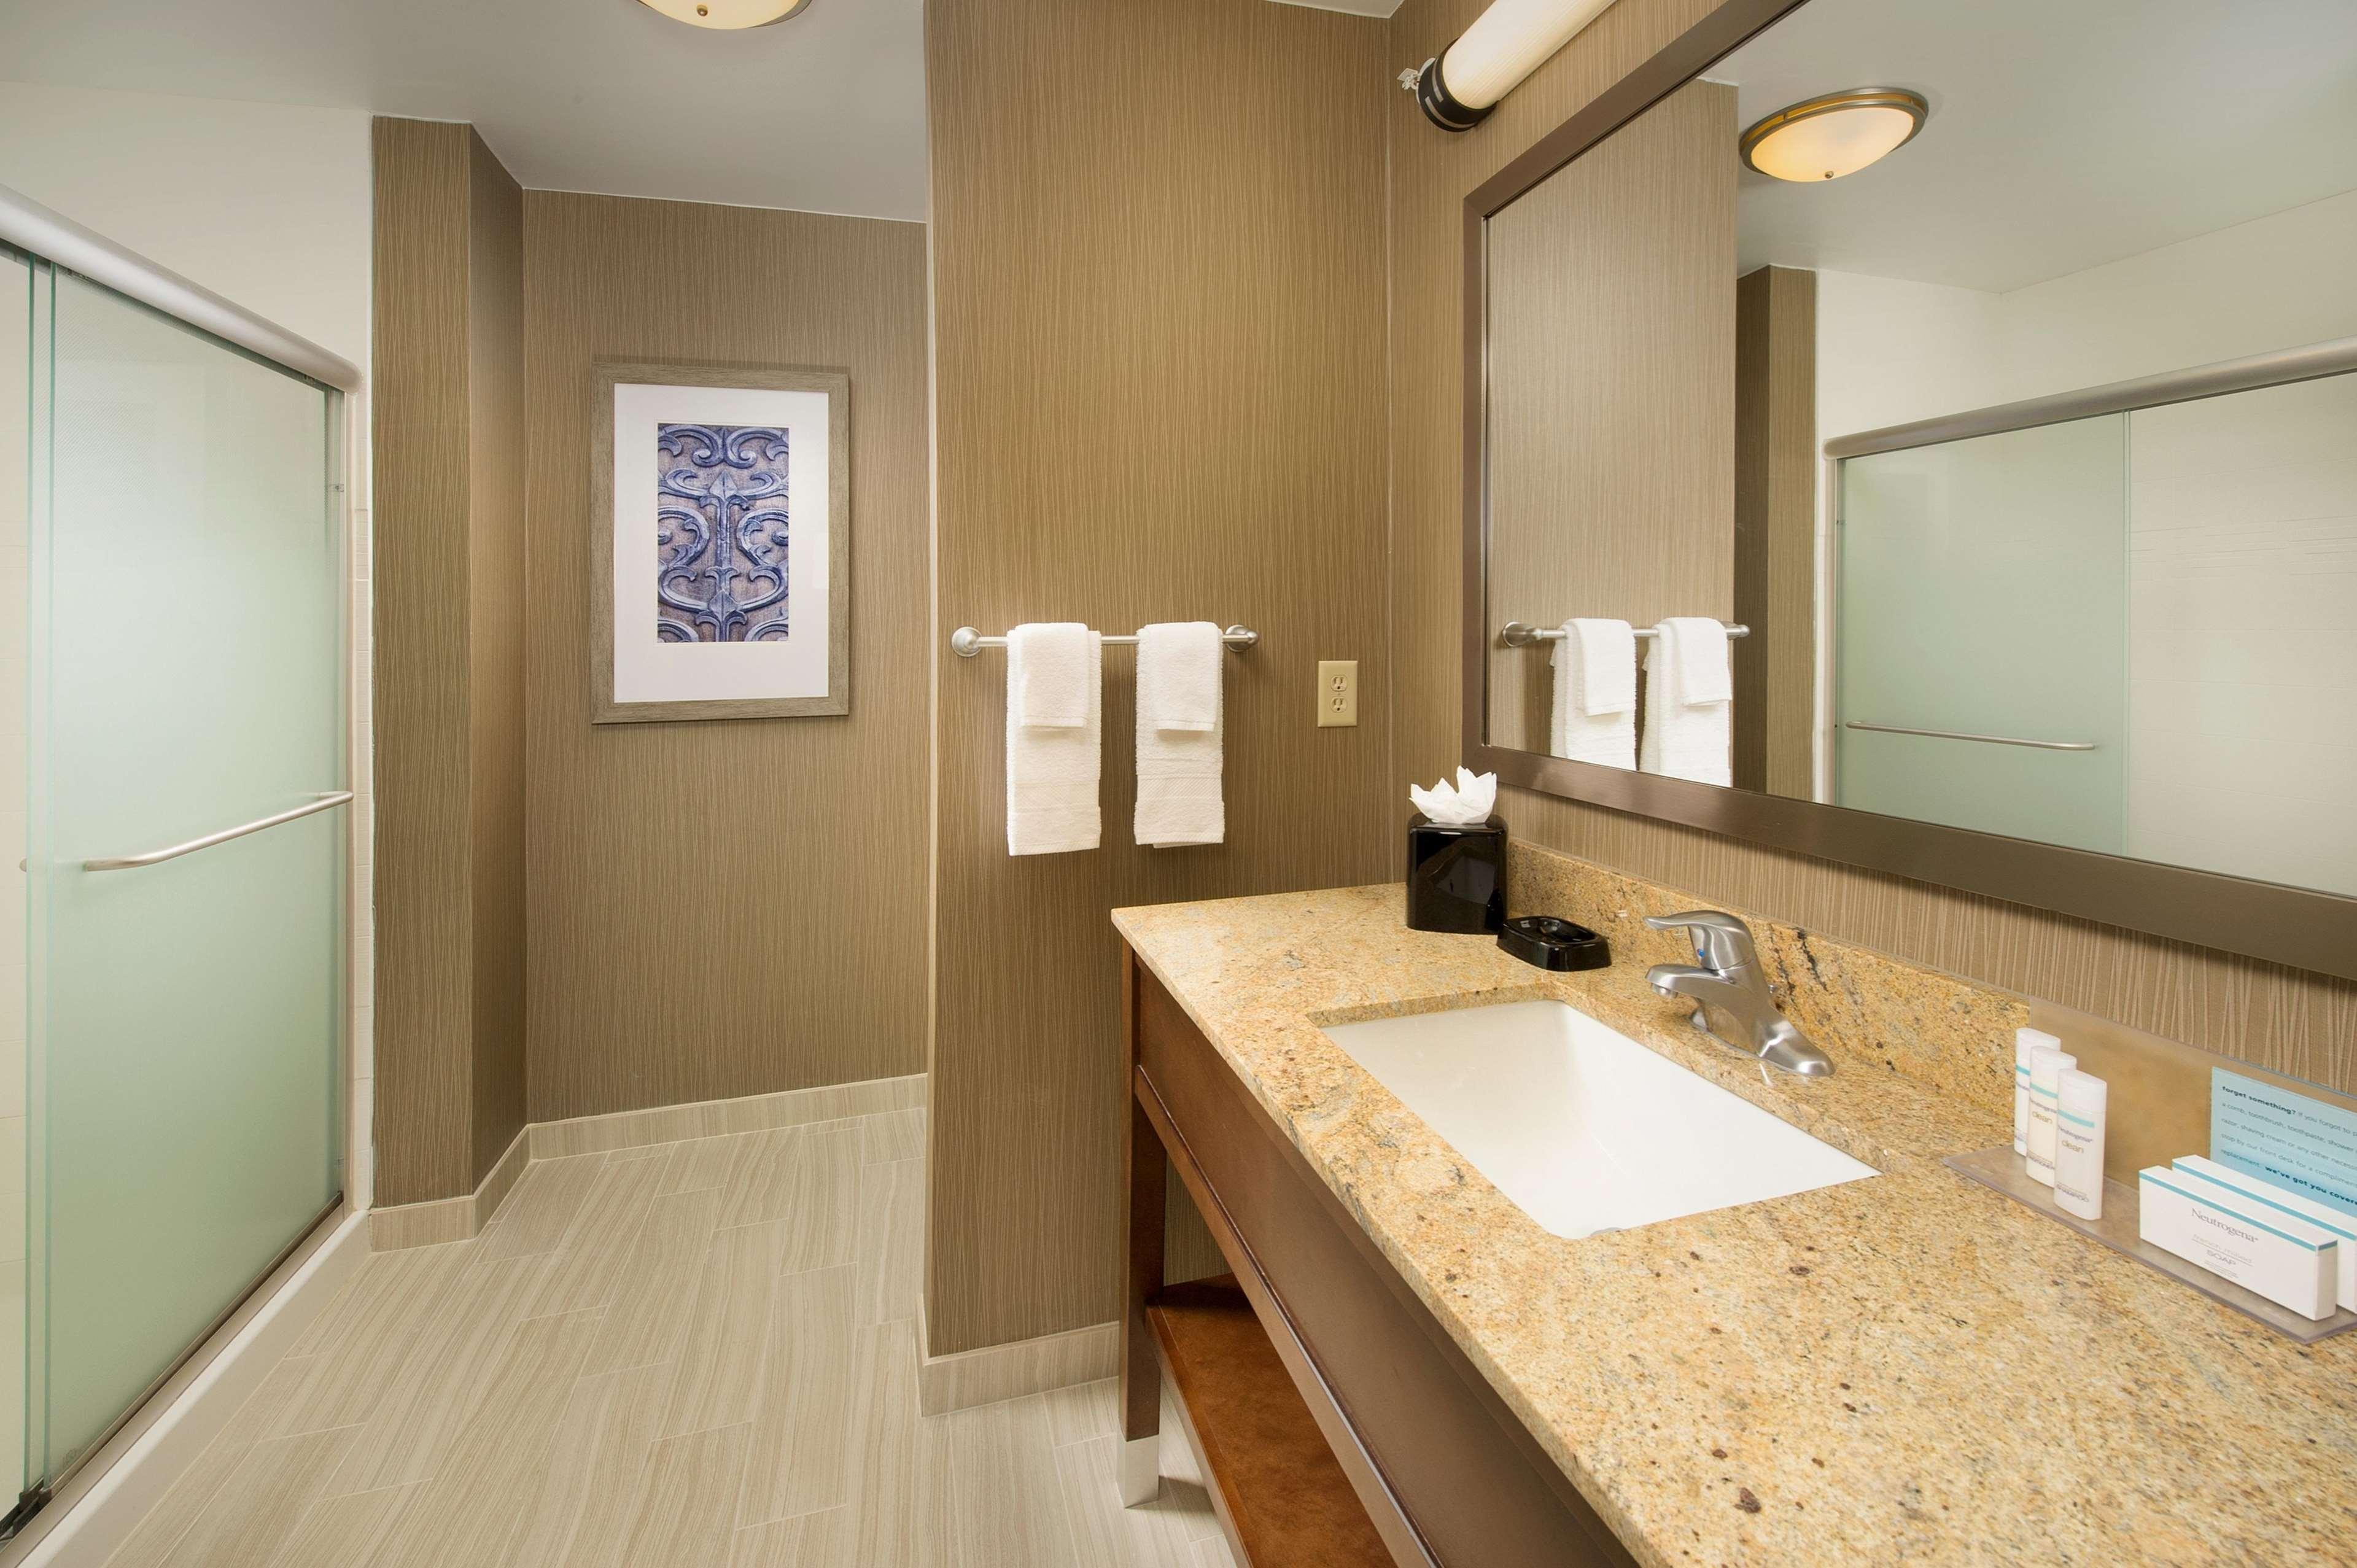 Hampton Inn & Suites San Antonio-Downtown/Market Square image 16